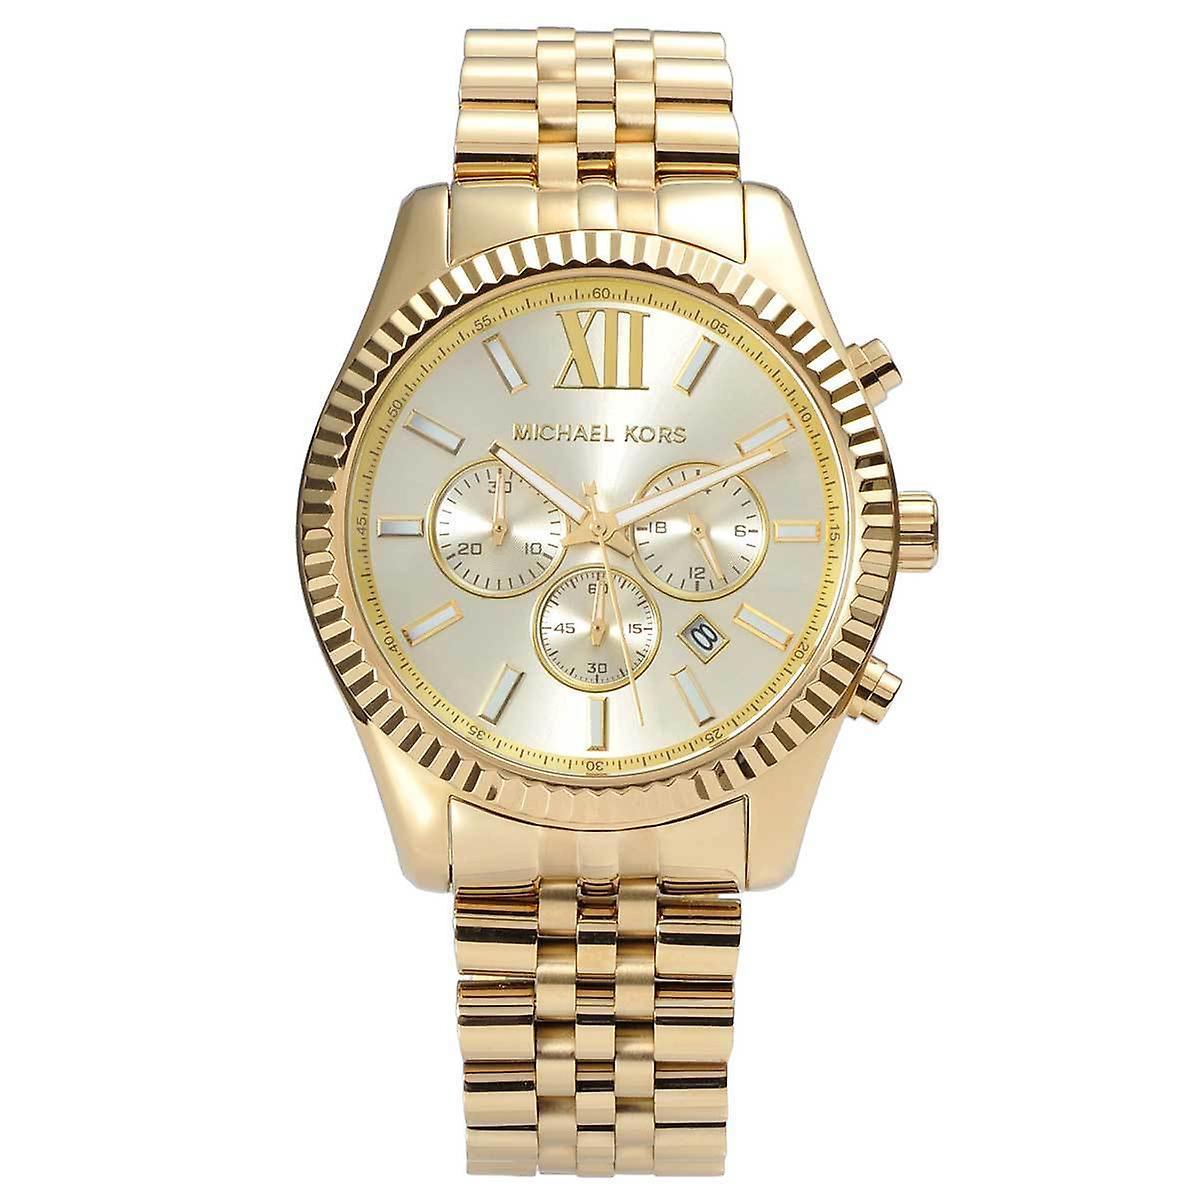 Michael Kors mannen Lexington Chronograph horloge MK8281